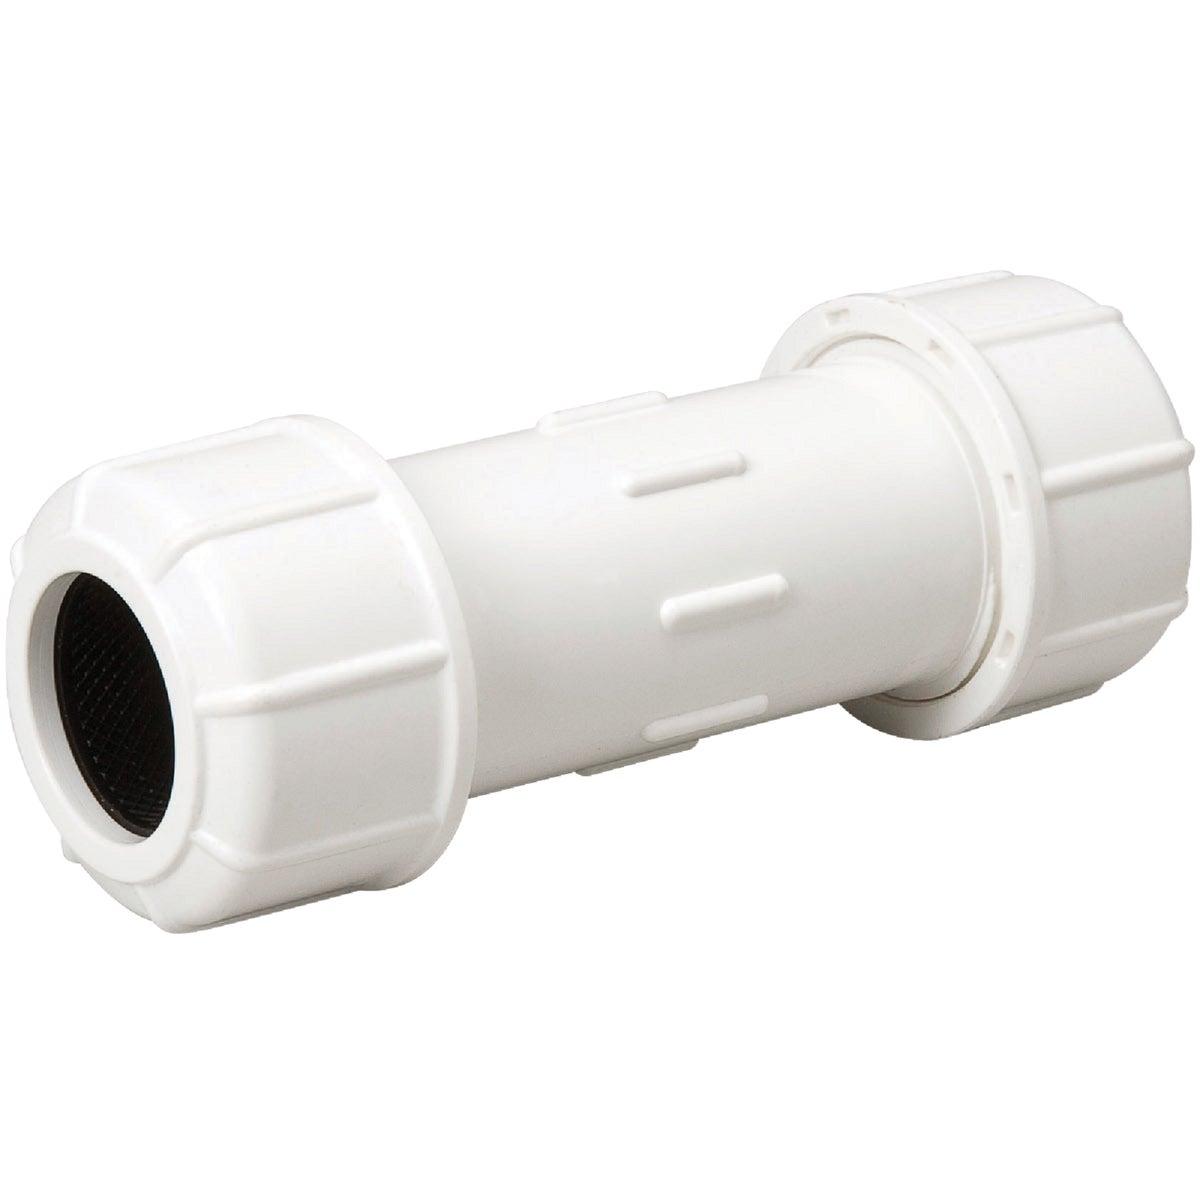 1X5-1/2 PVC COUPLING - 160-105 by Mueller B K